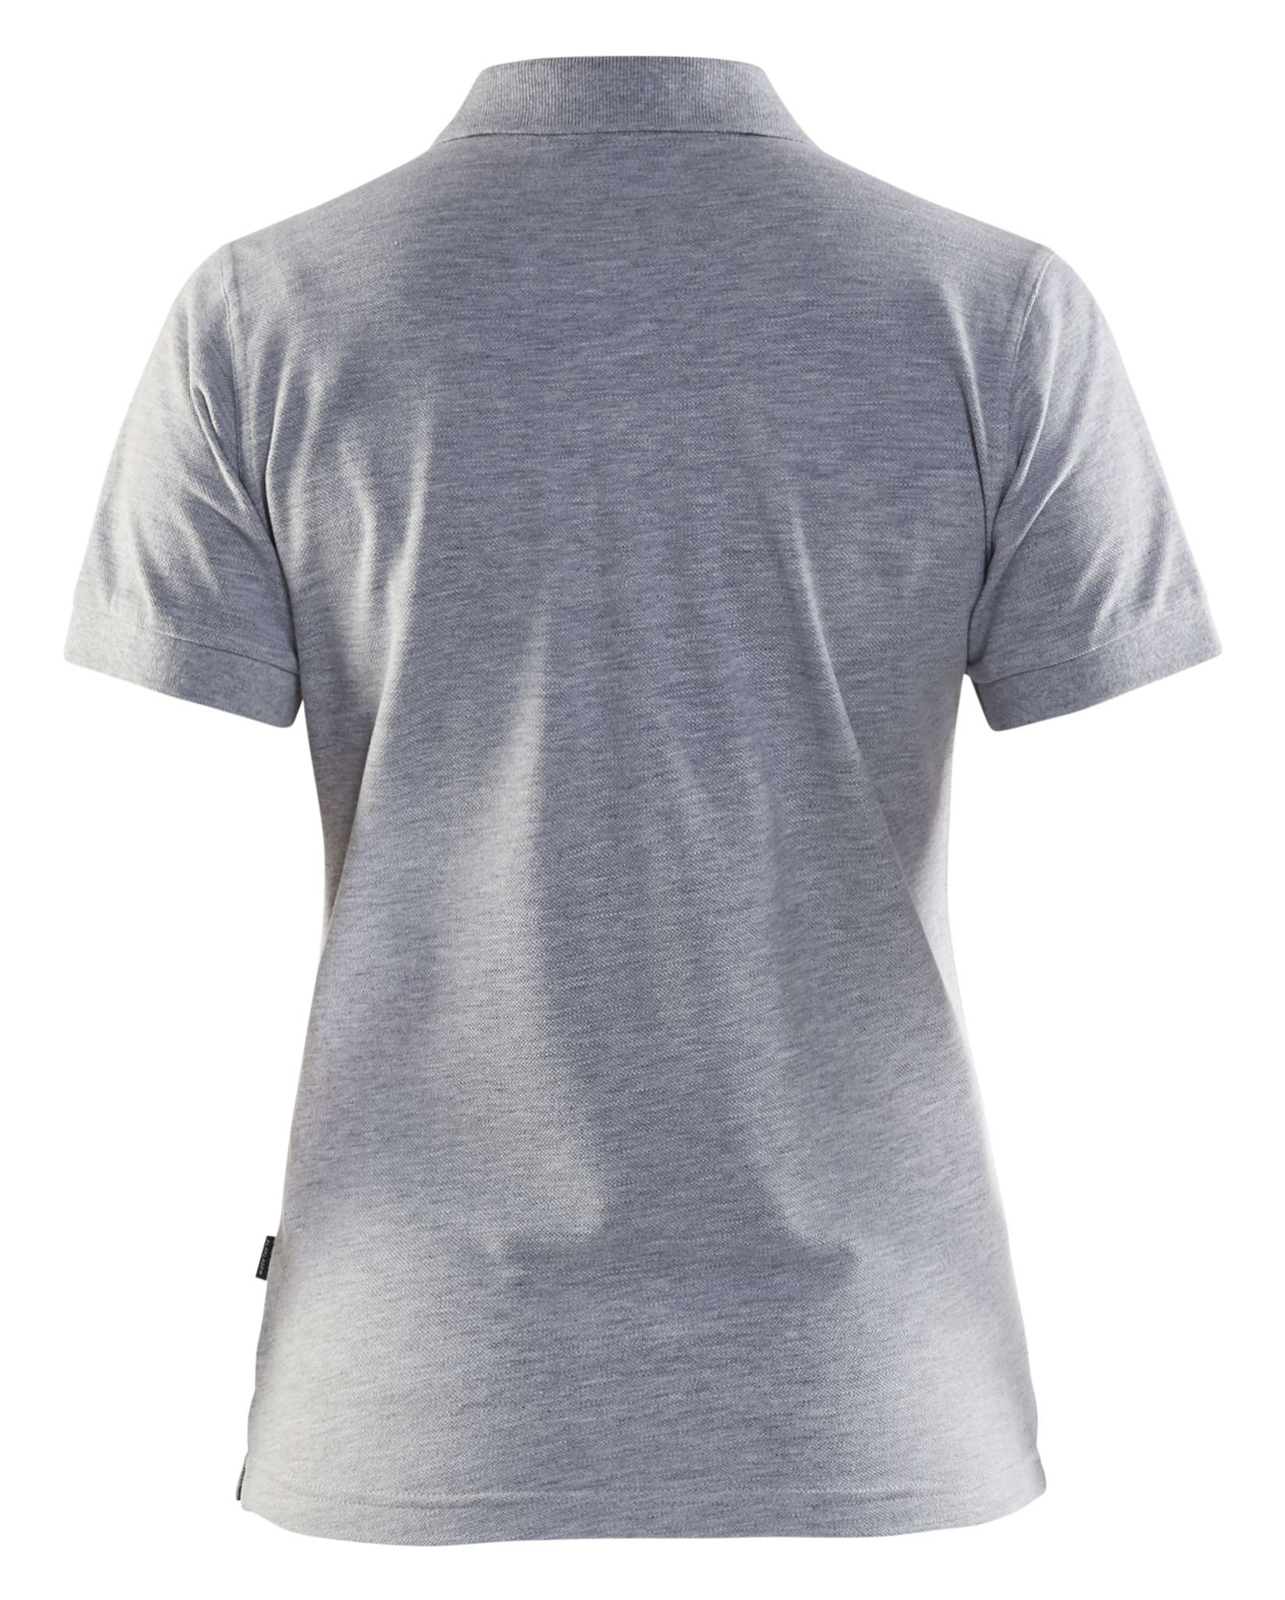 Blaklader Dames polo shirts 33071035 grijsmelee(9000)